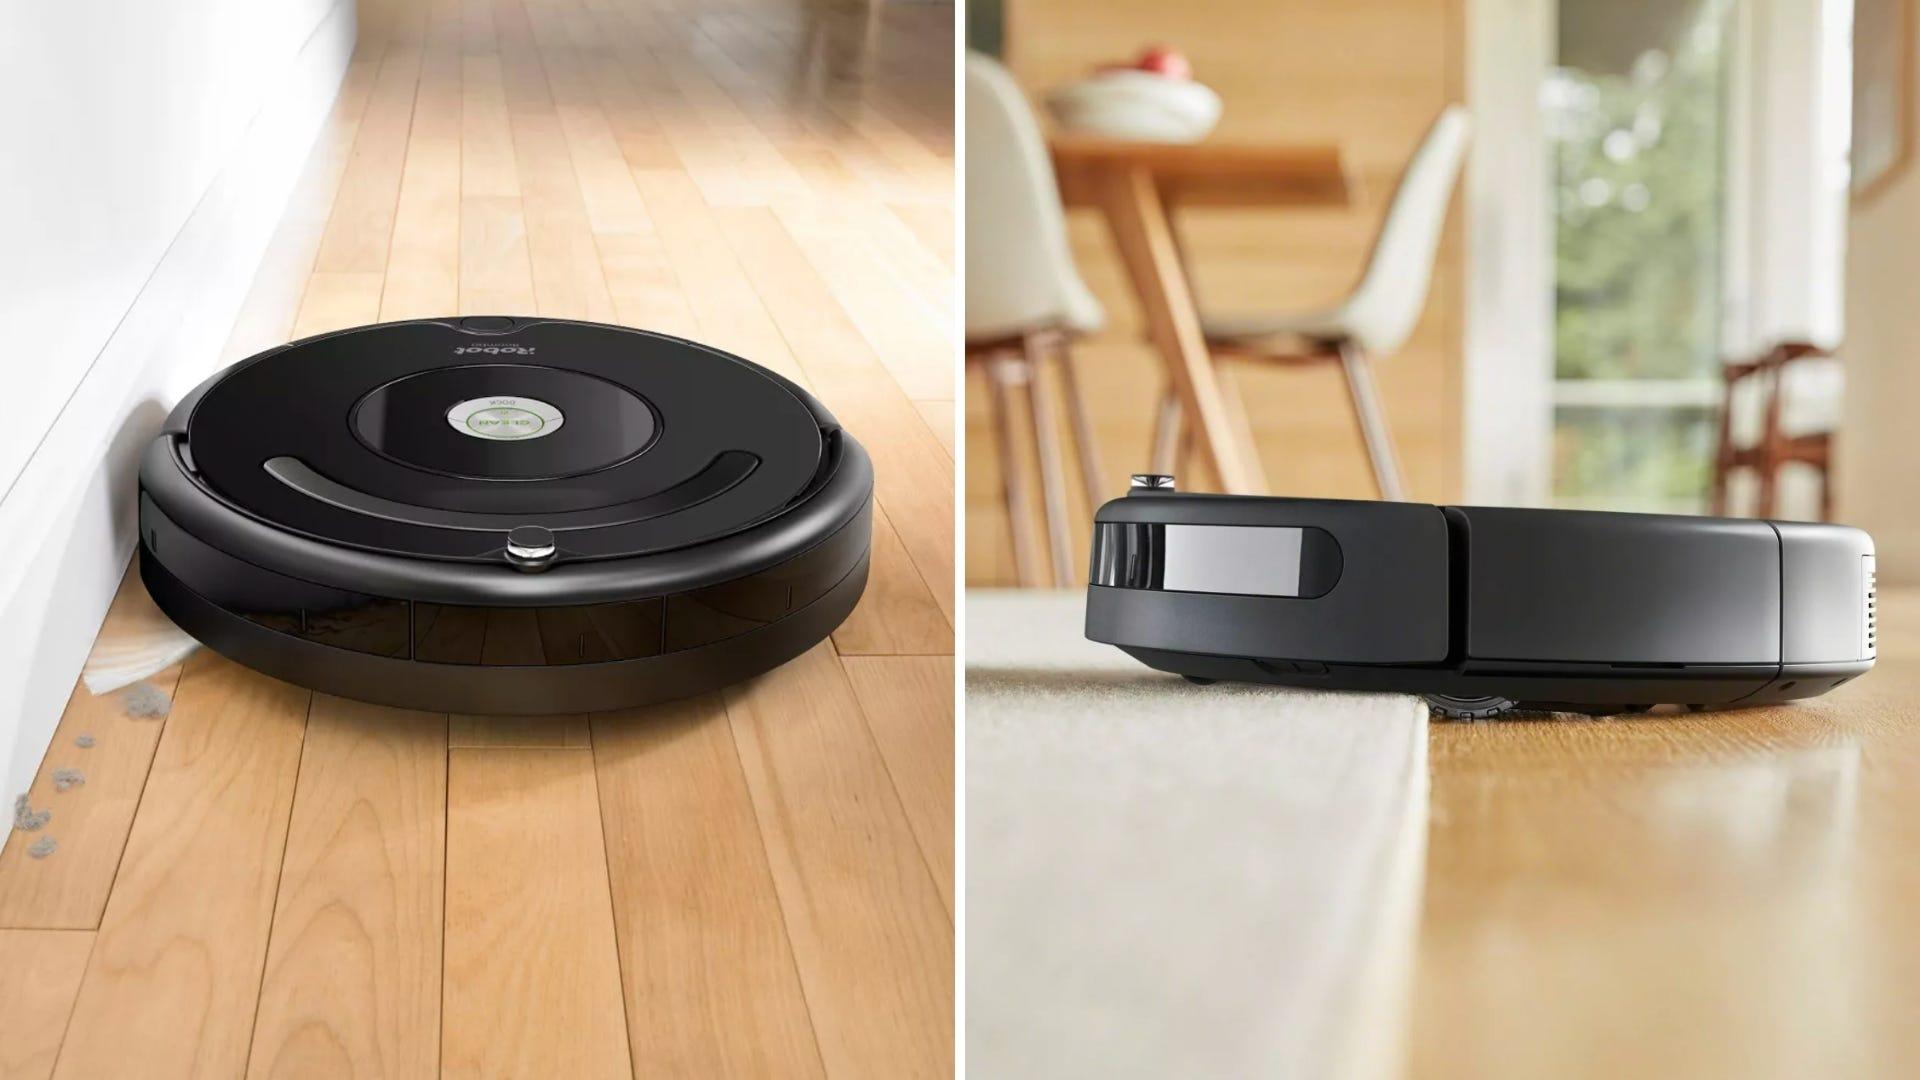 The iRobot Roomba 675 vacuuming a hardwood floor and area rug.